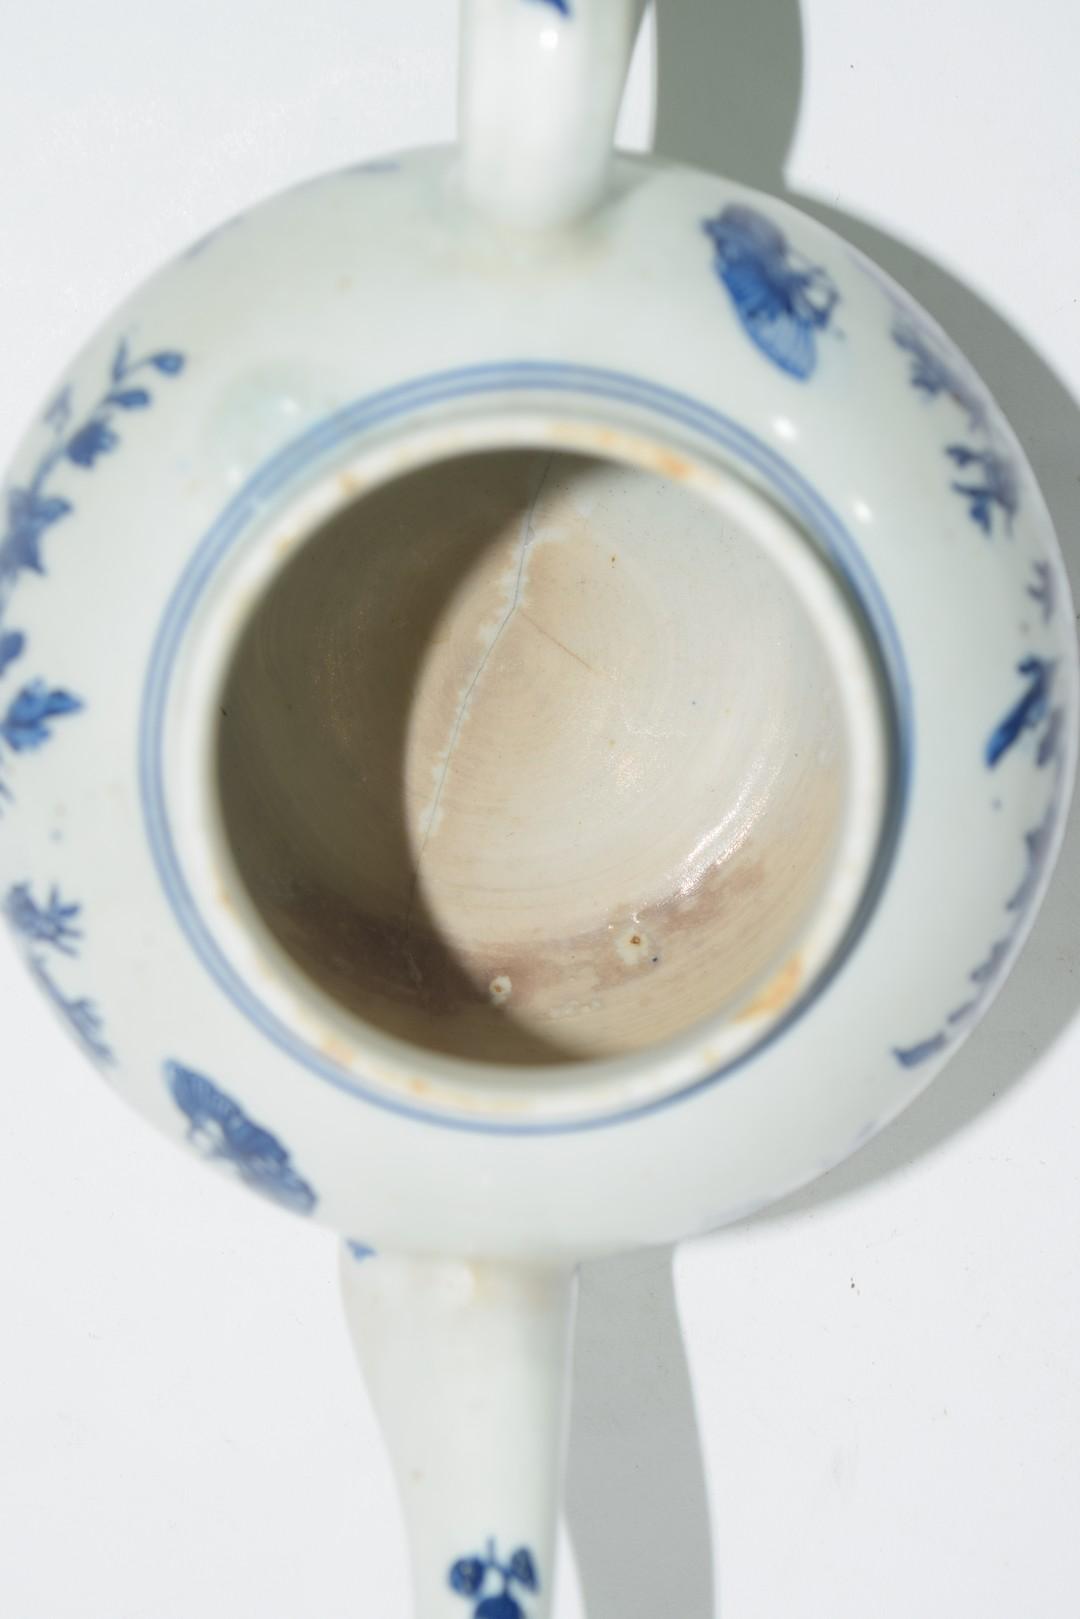 18th century Lowestoft porcelain teapot - Image 6 of 8